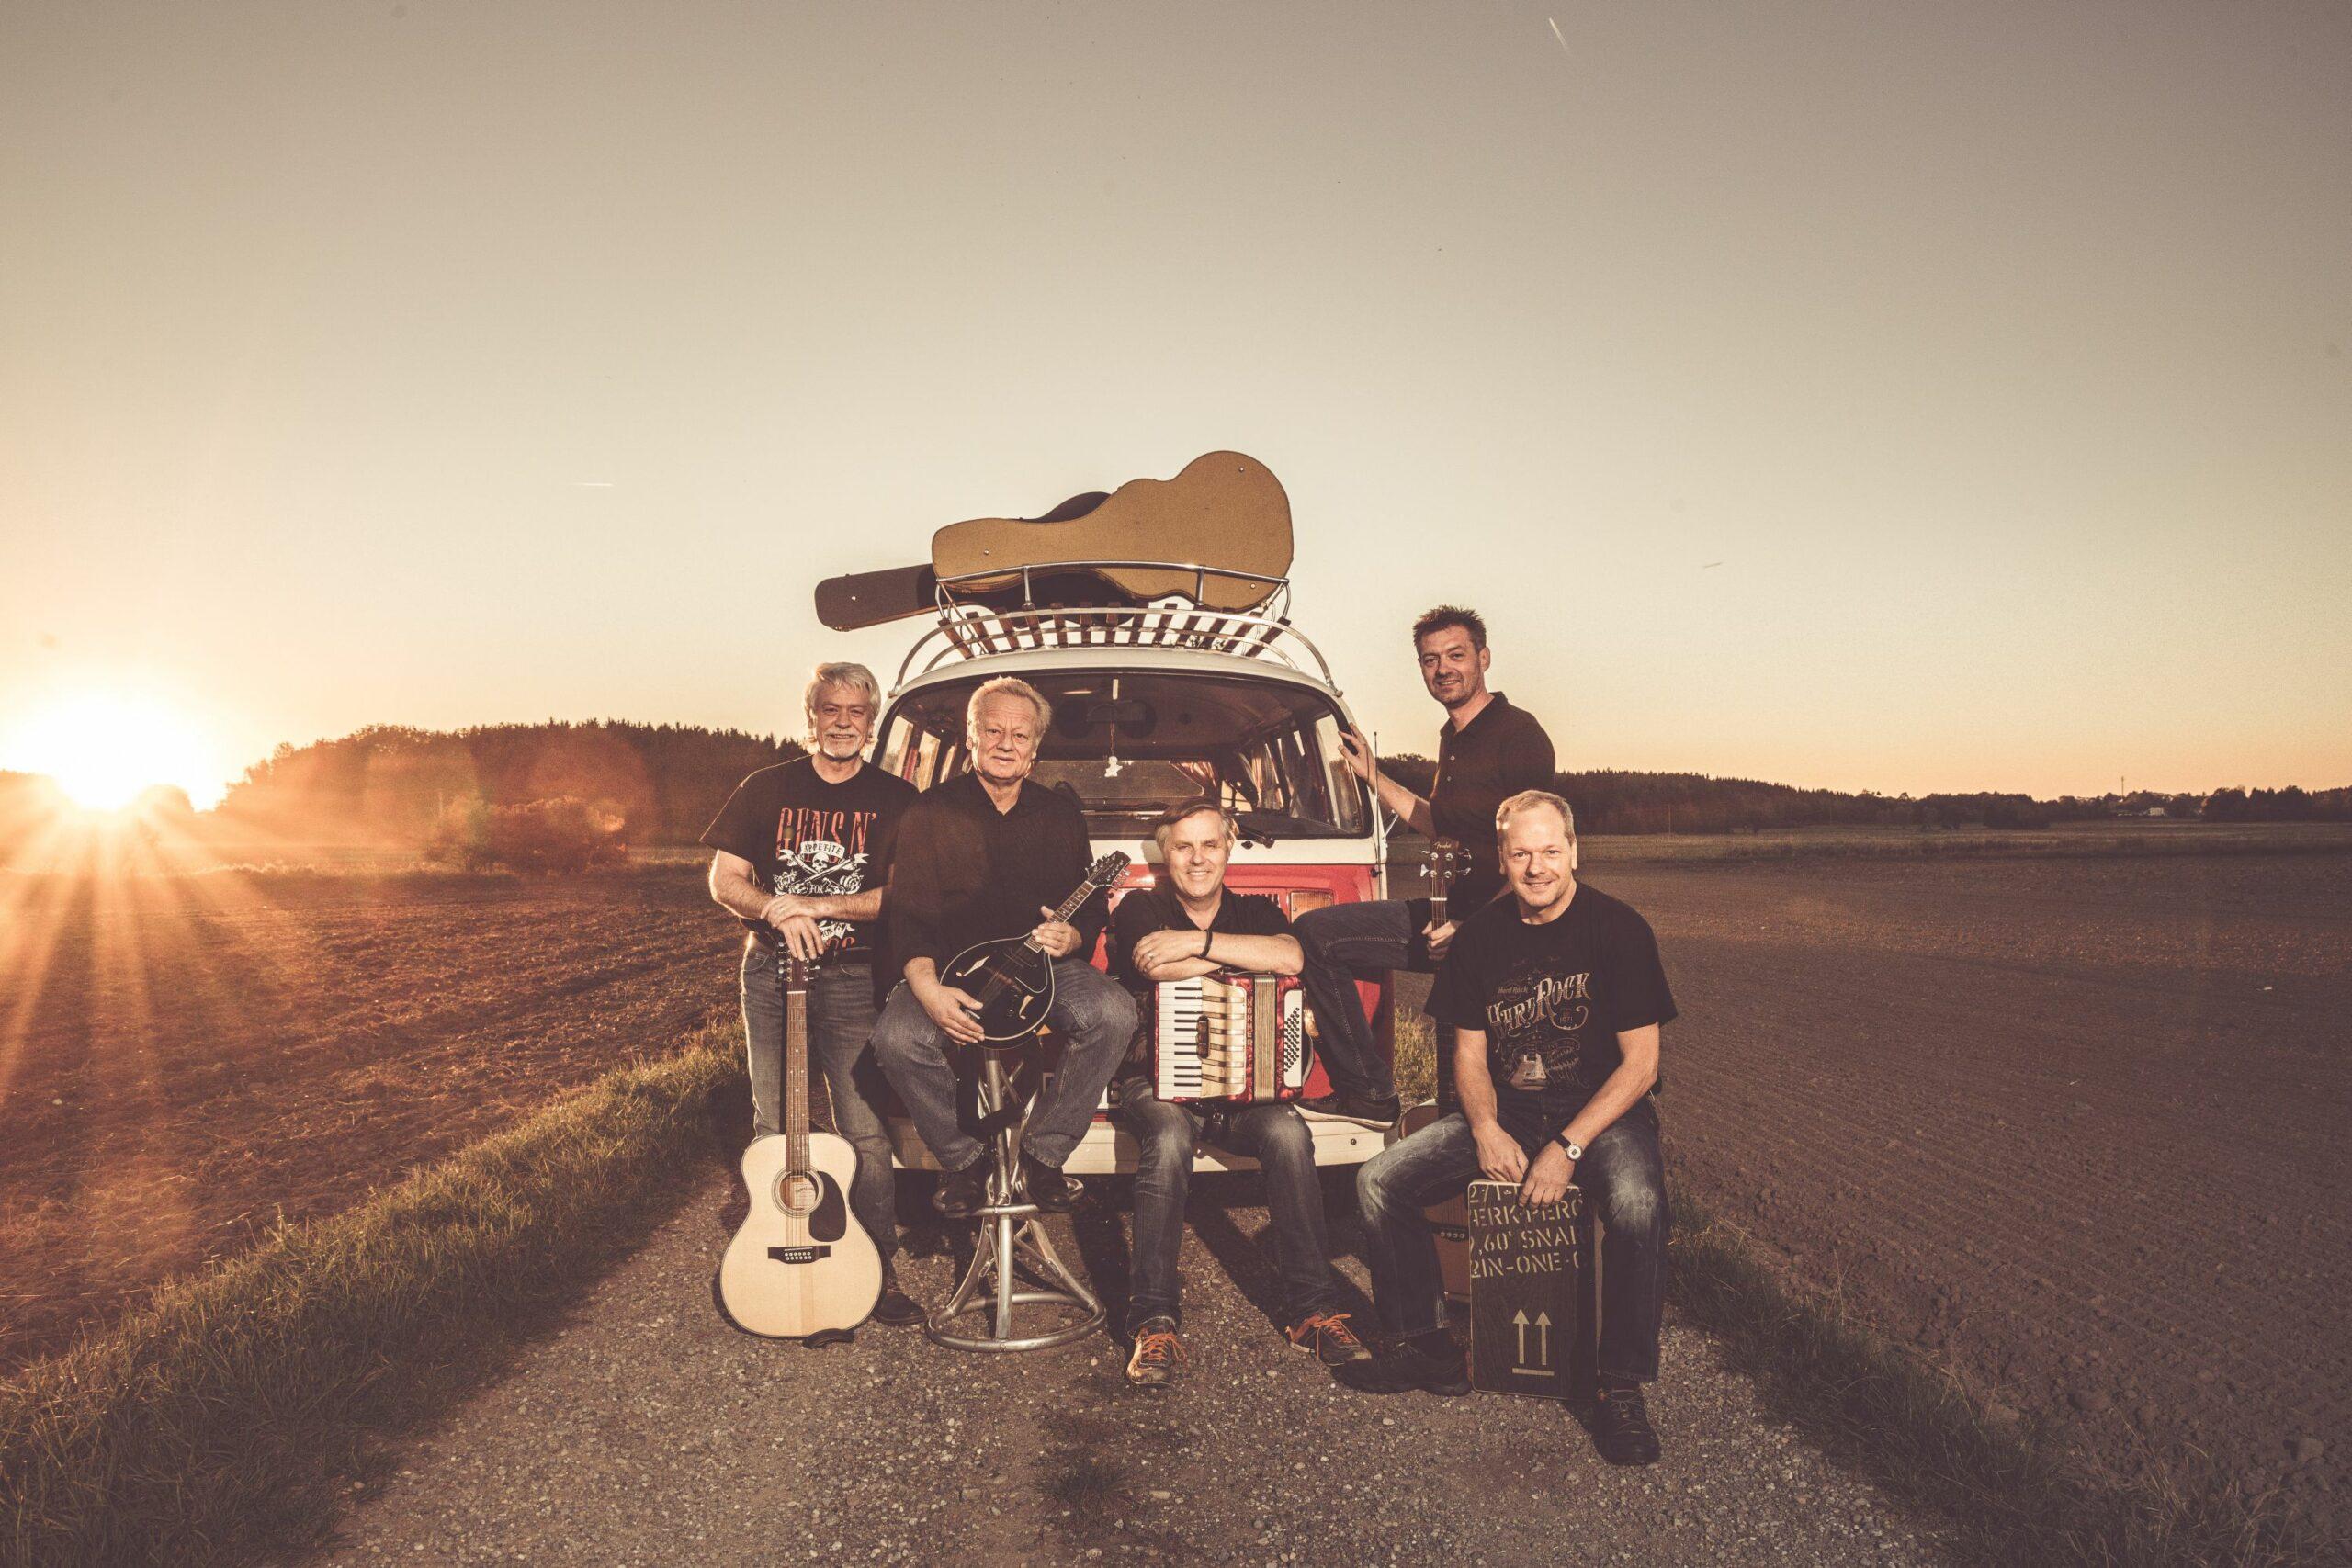 Band UNPLAQUED PROCHECKED mit Tourbus